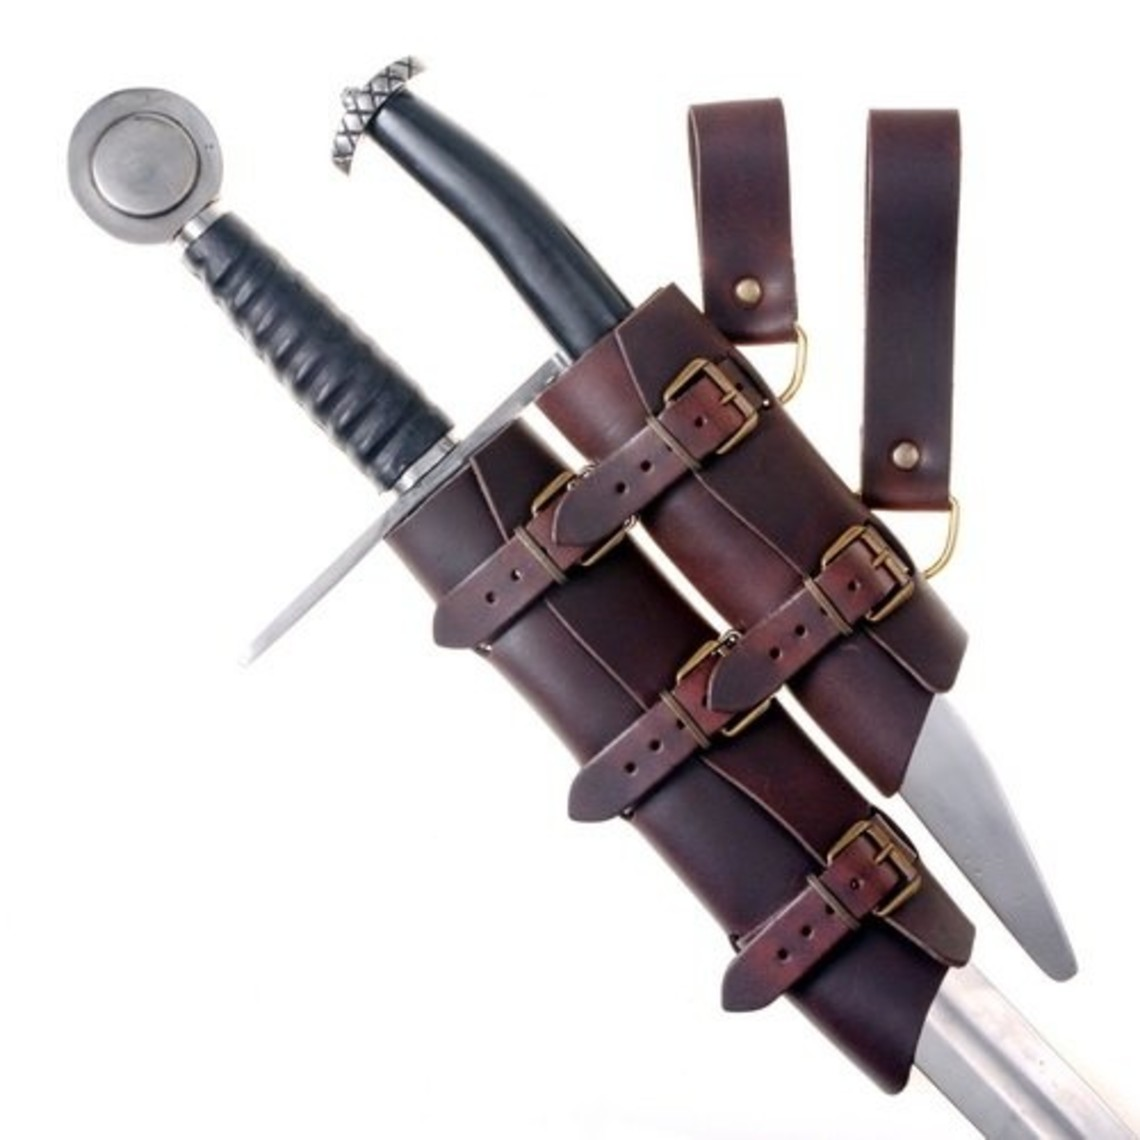 Lujosa espada y daga titular, negro-marrón